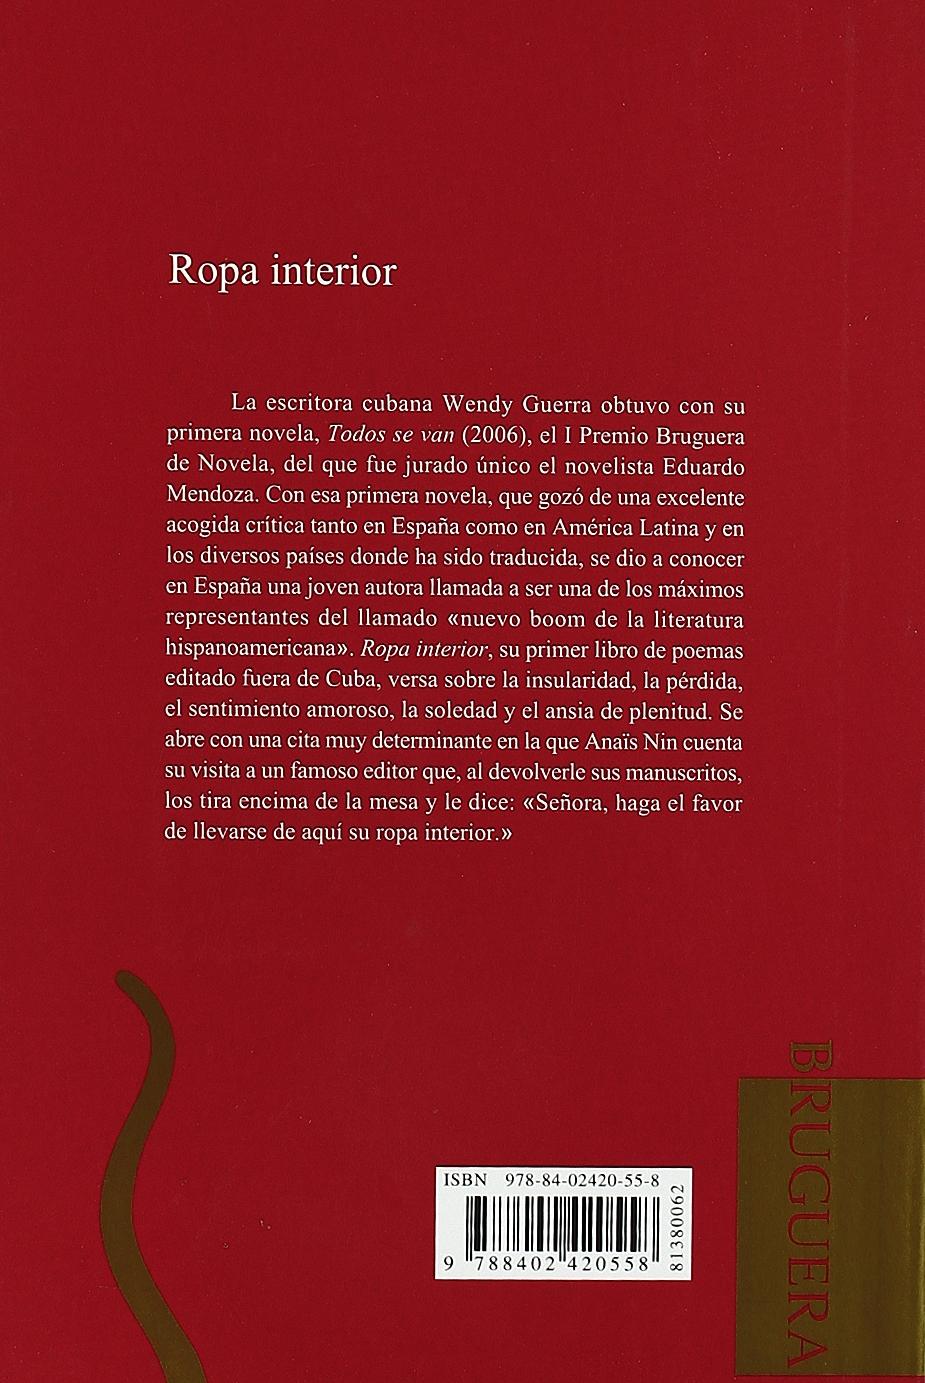 Ropa interior (Bruguera Poesia) (Spanish Edition): Wendy Guerra: 9788402420558: Amazon.com: Books